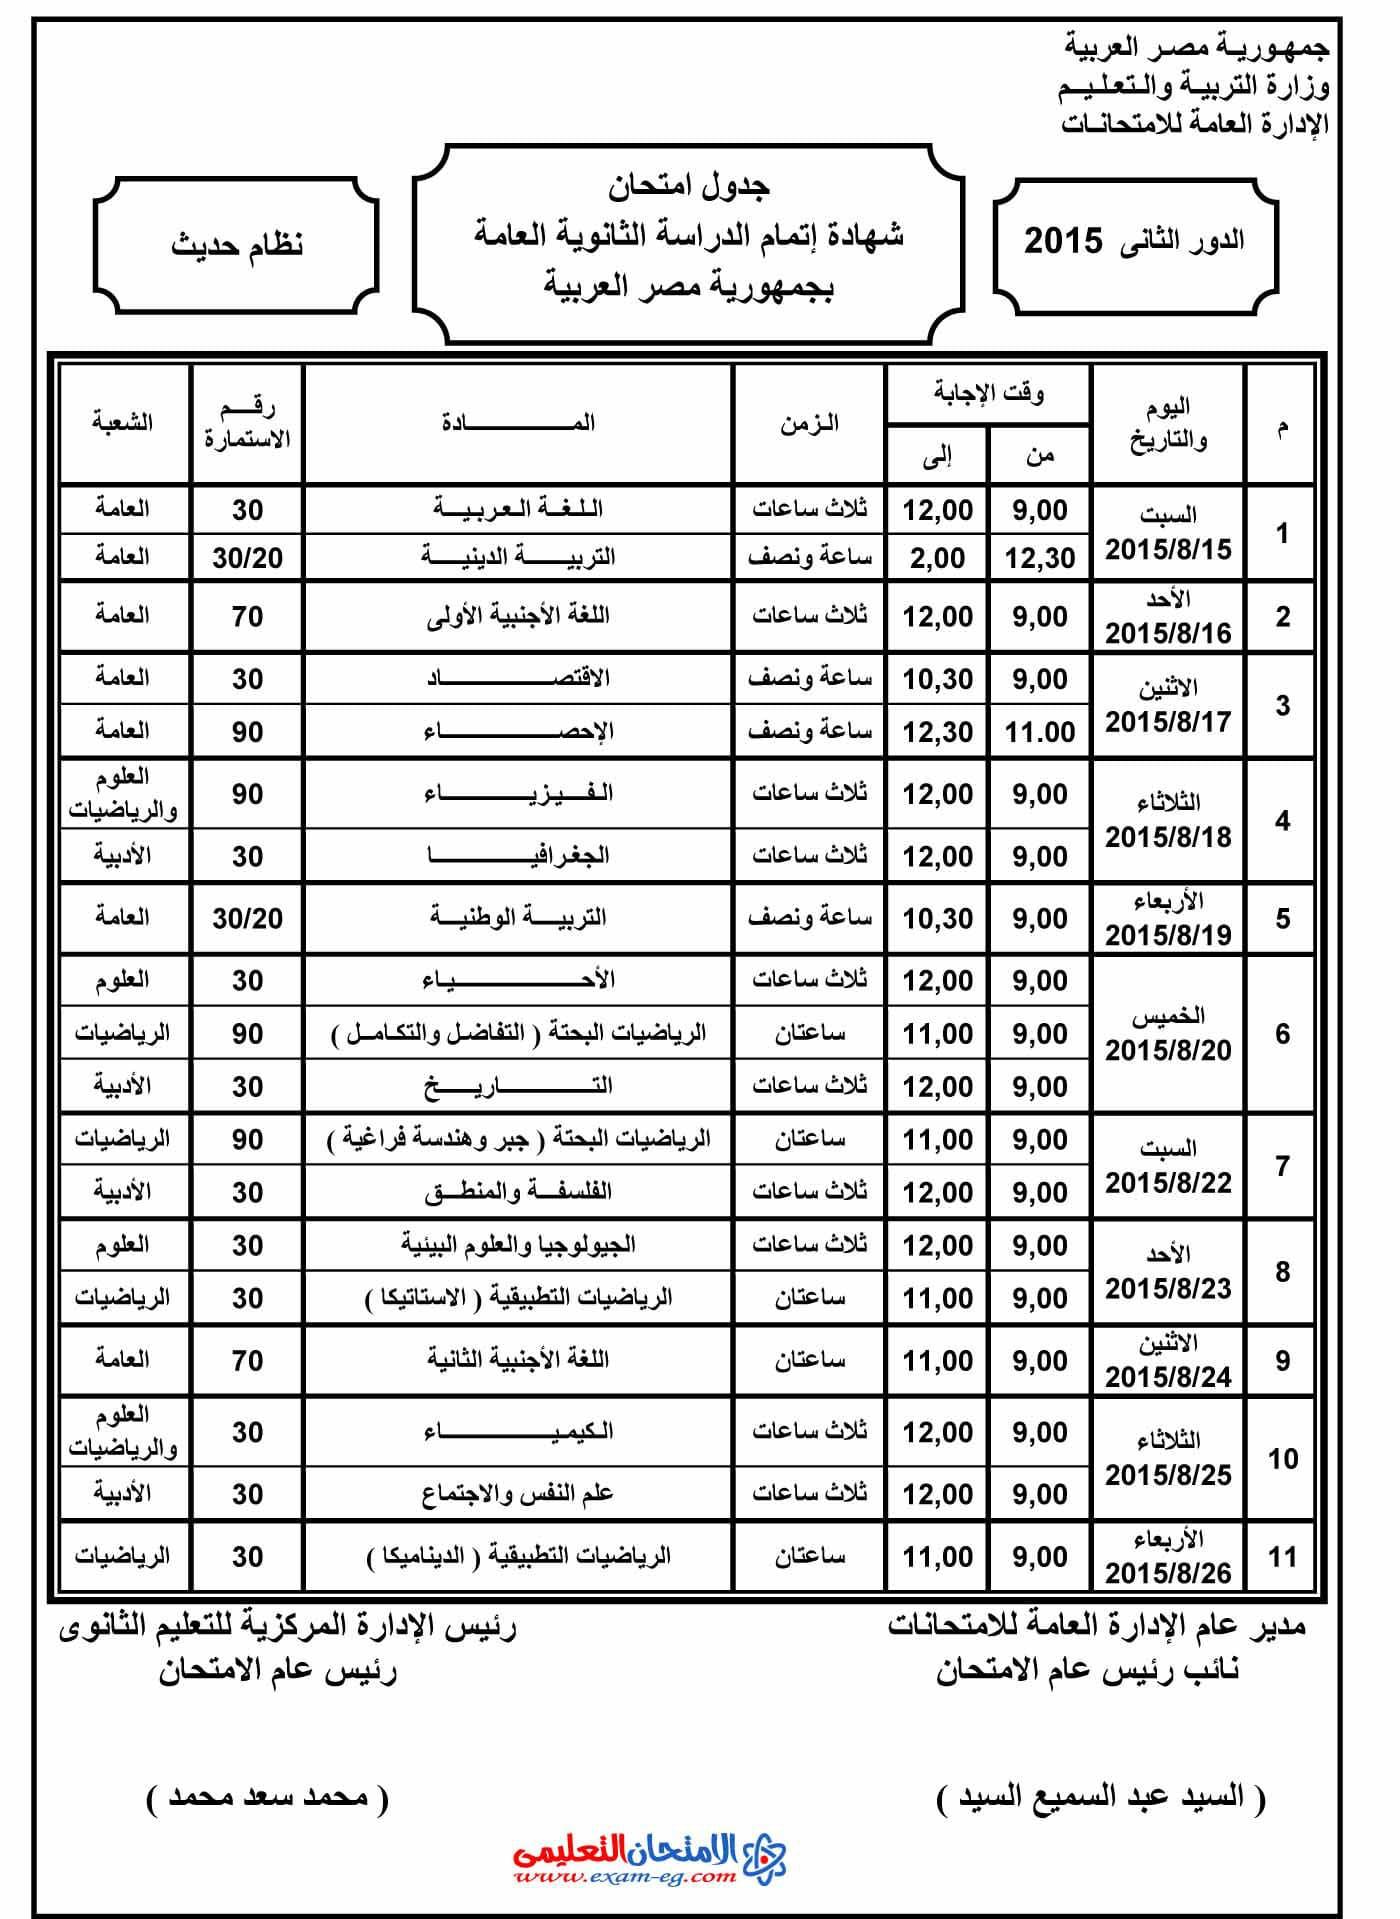 exam-eg.com_1435766761251.jpg